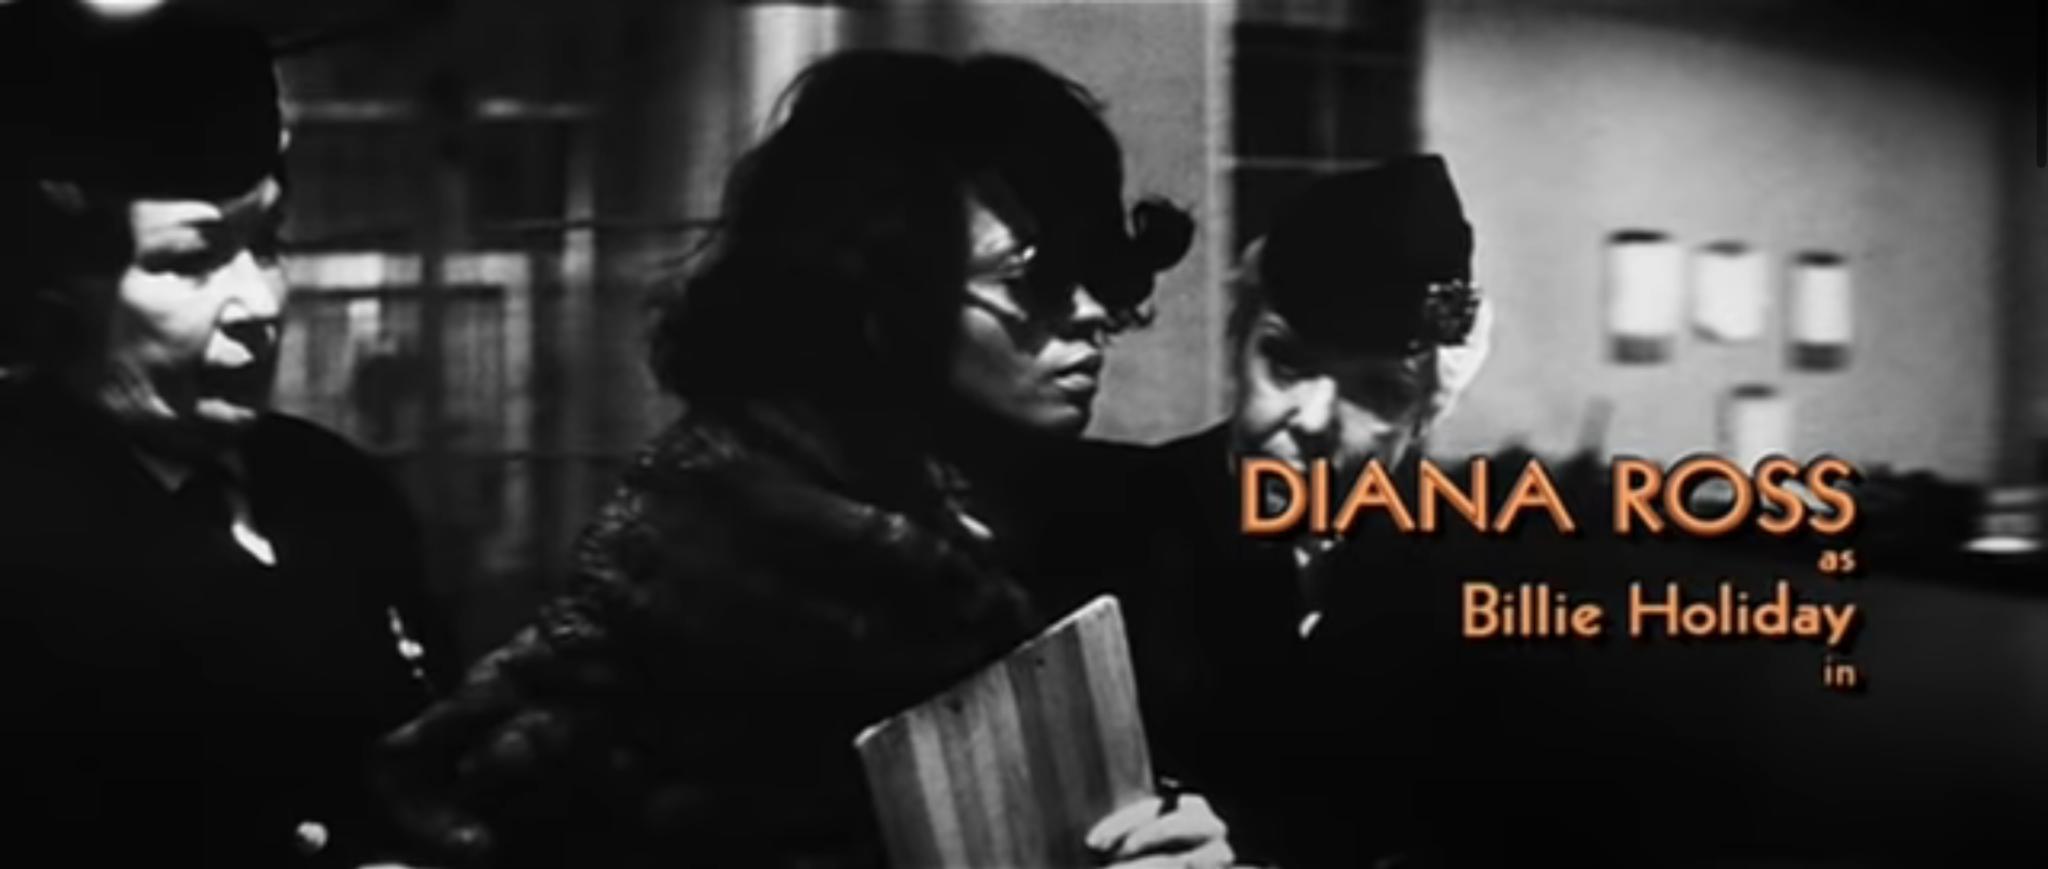 diana ross black hollywood films